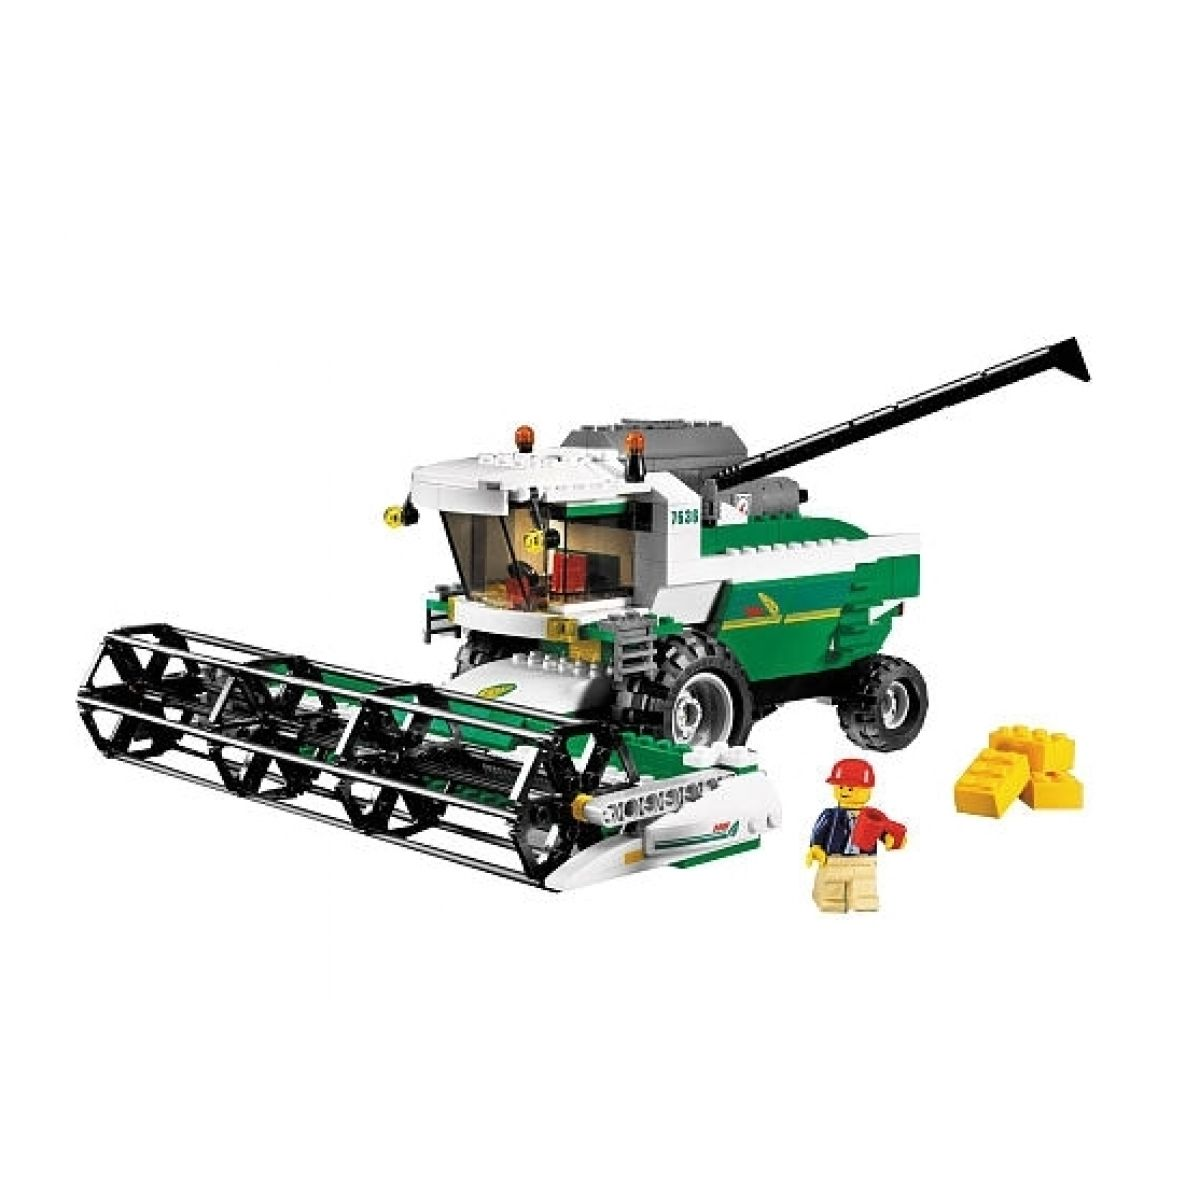 LEGO CITY 7636 Kombajn